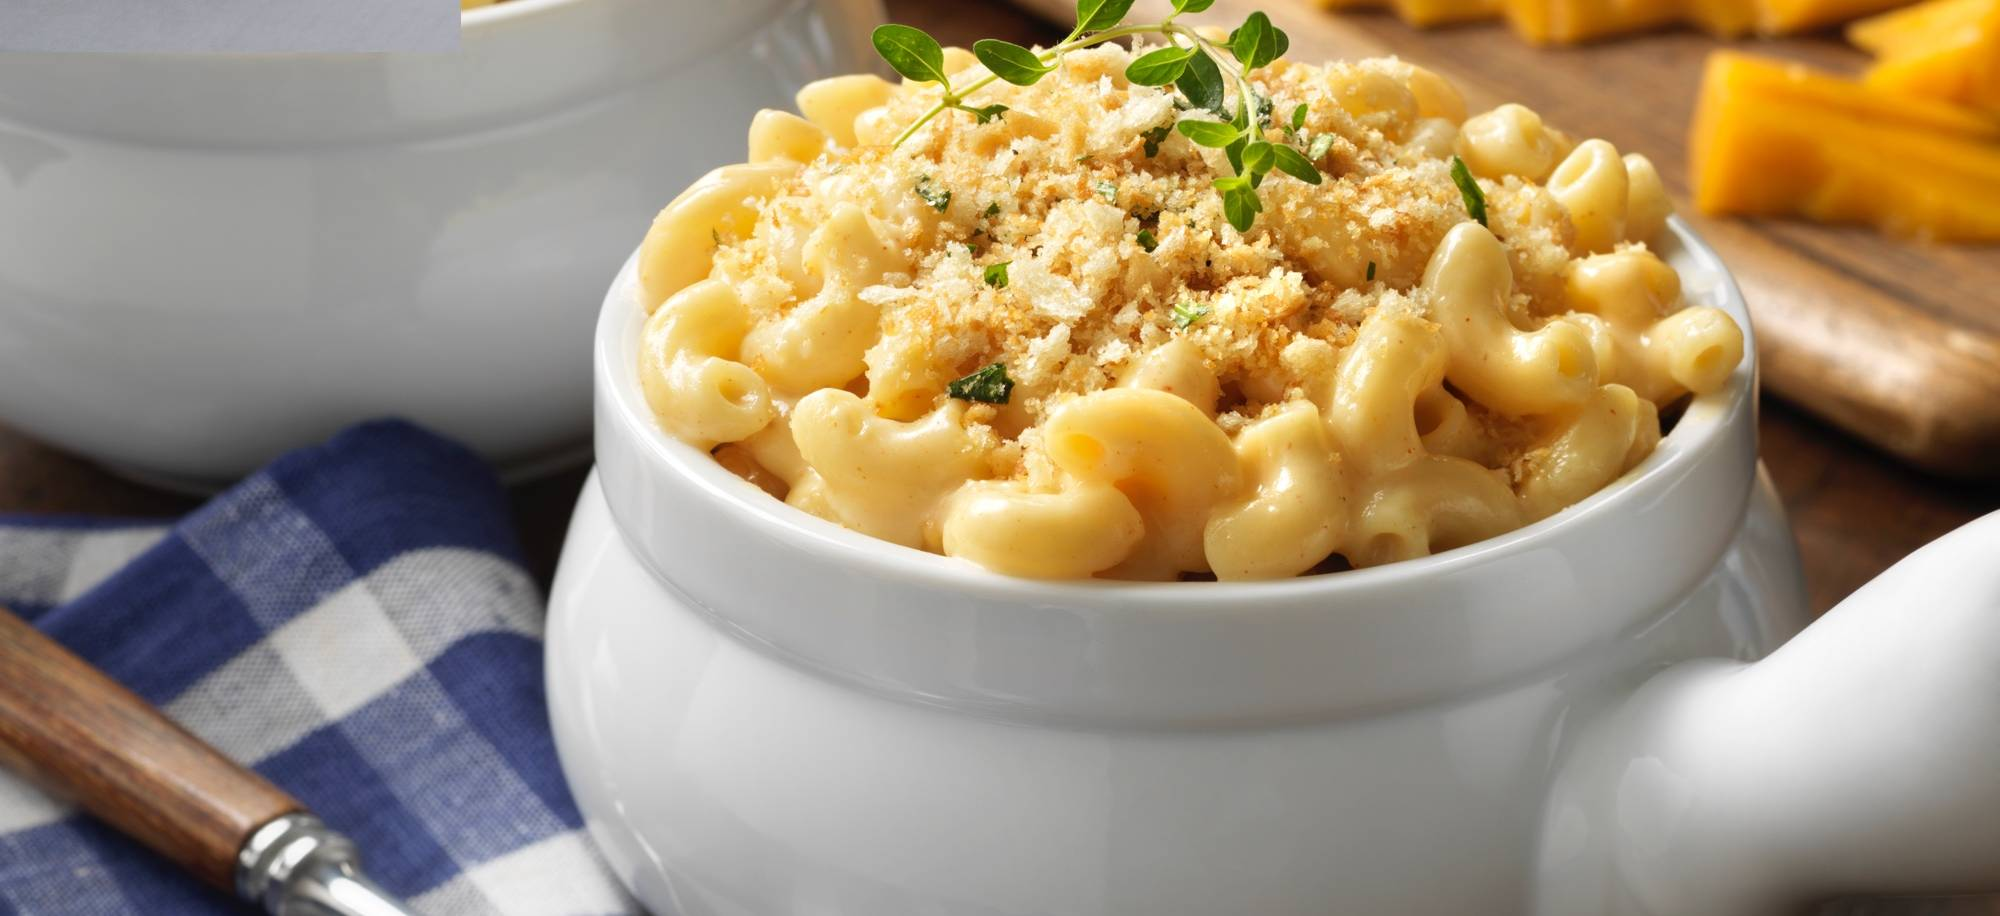 Recette gratin de macaroni